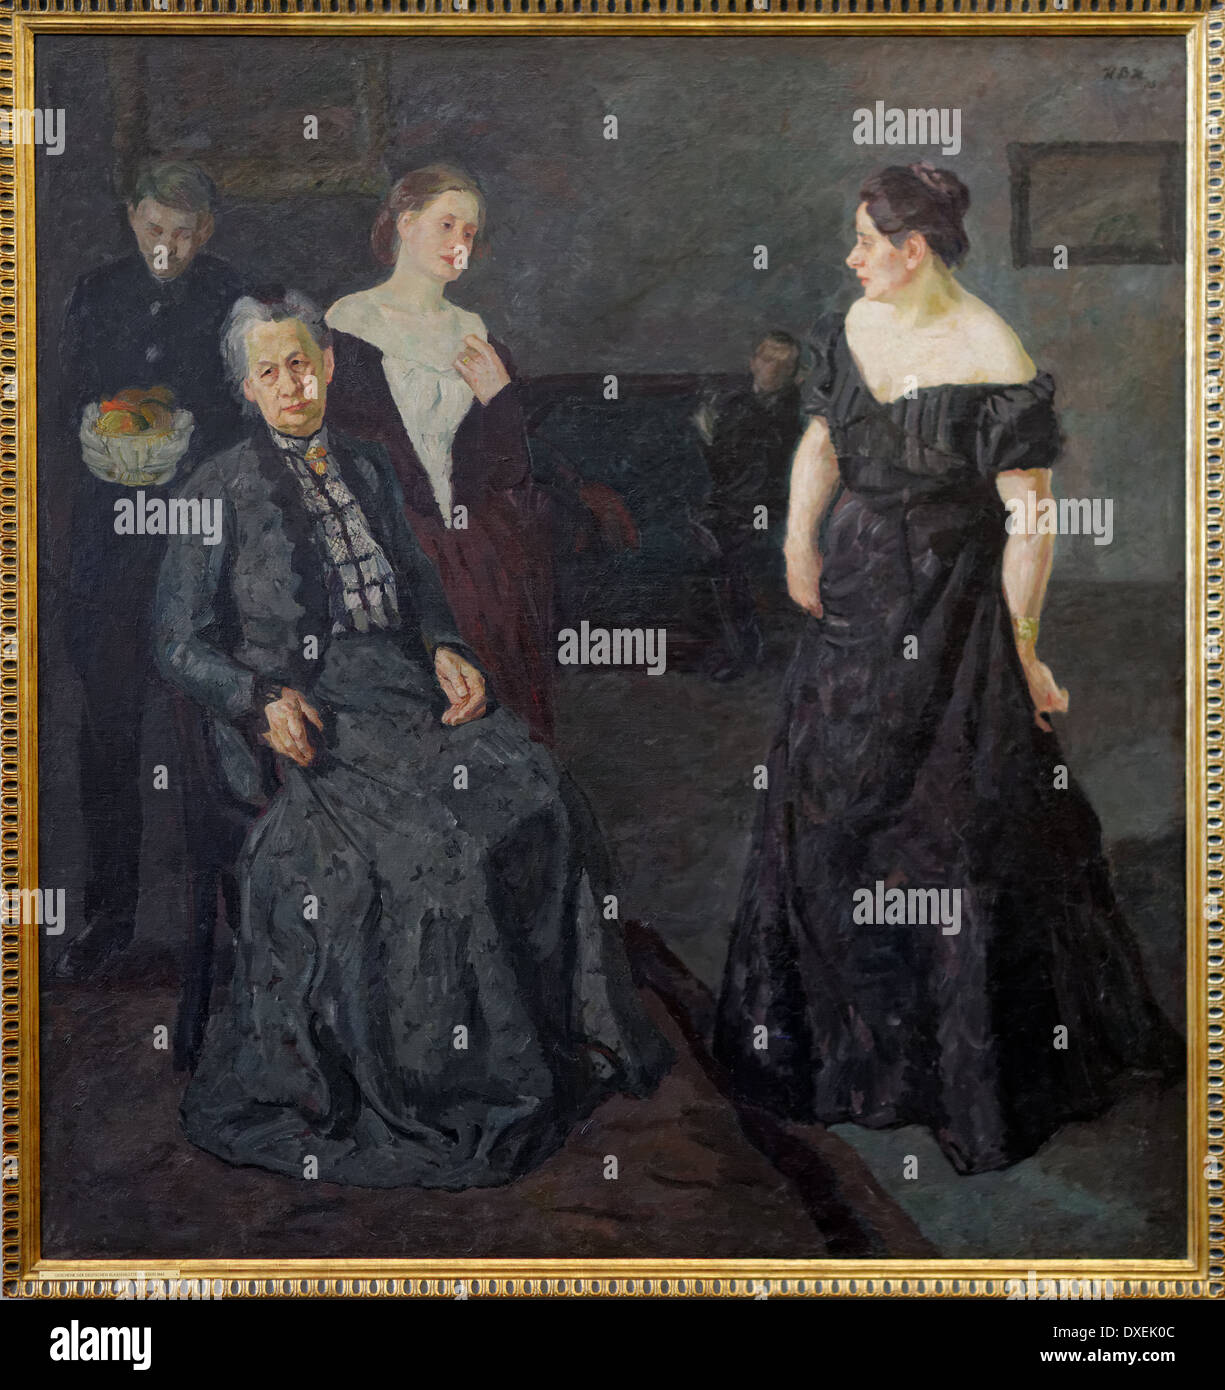 Max Beckmann - Conversation - 1908 - XX th century - German school - Alte Nationalgalerie - Berlin - Stock Image